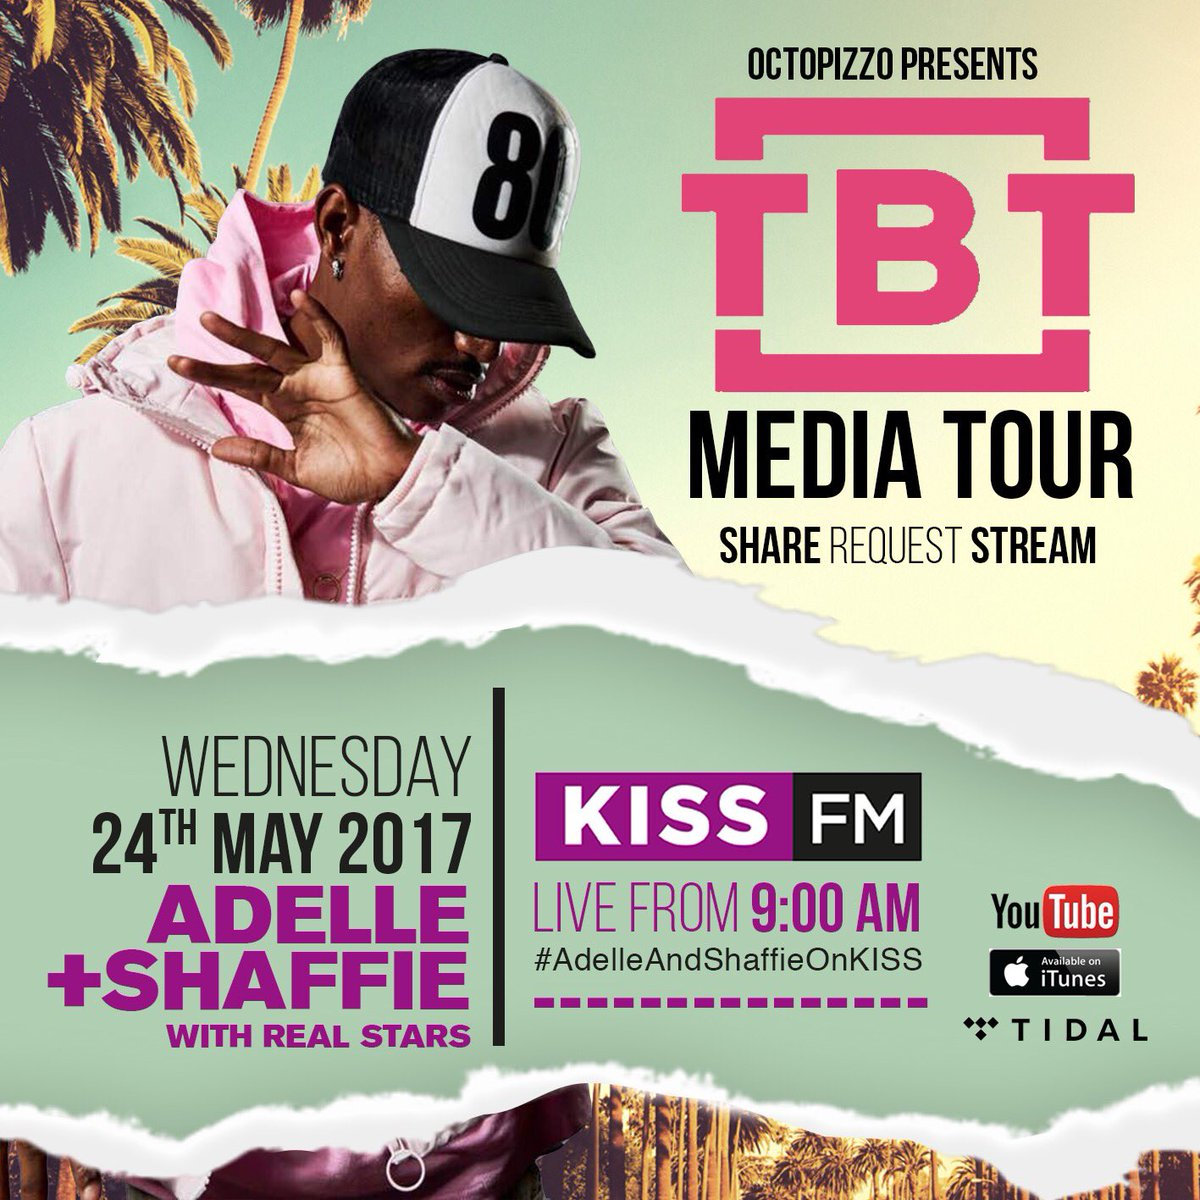 Going live on @Kiss100kenya in a few!!! #TBT   https:// youtu.be/X3vvoh6OFXI  &nbsp;  <br>http://pic.twitter.com/SAWxPJO2zi